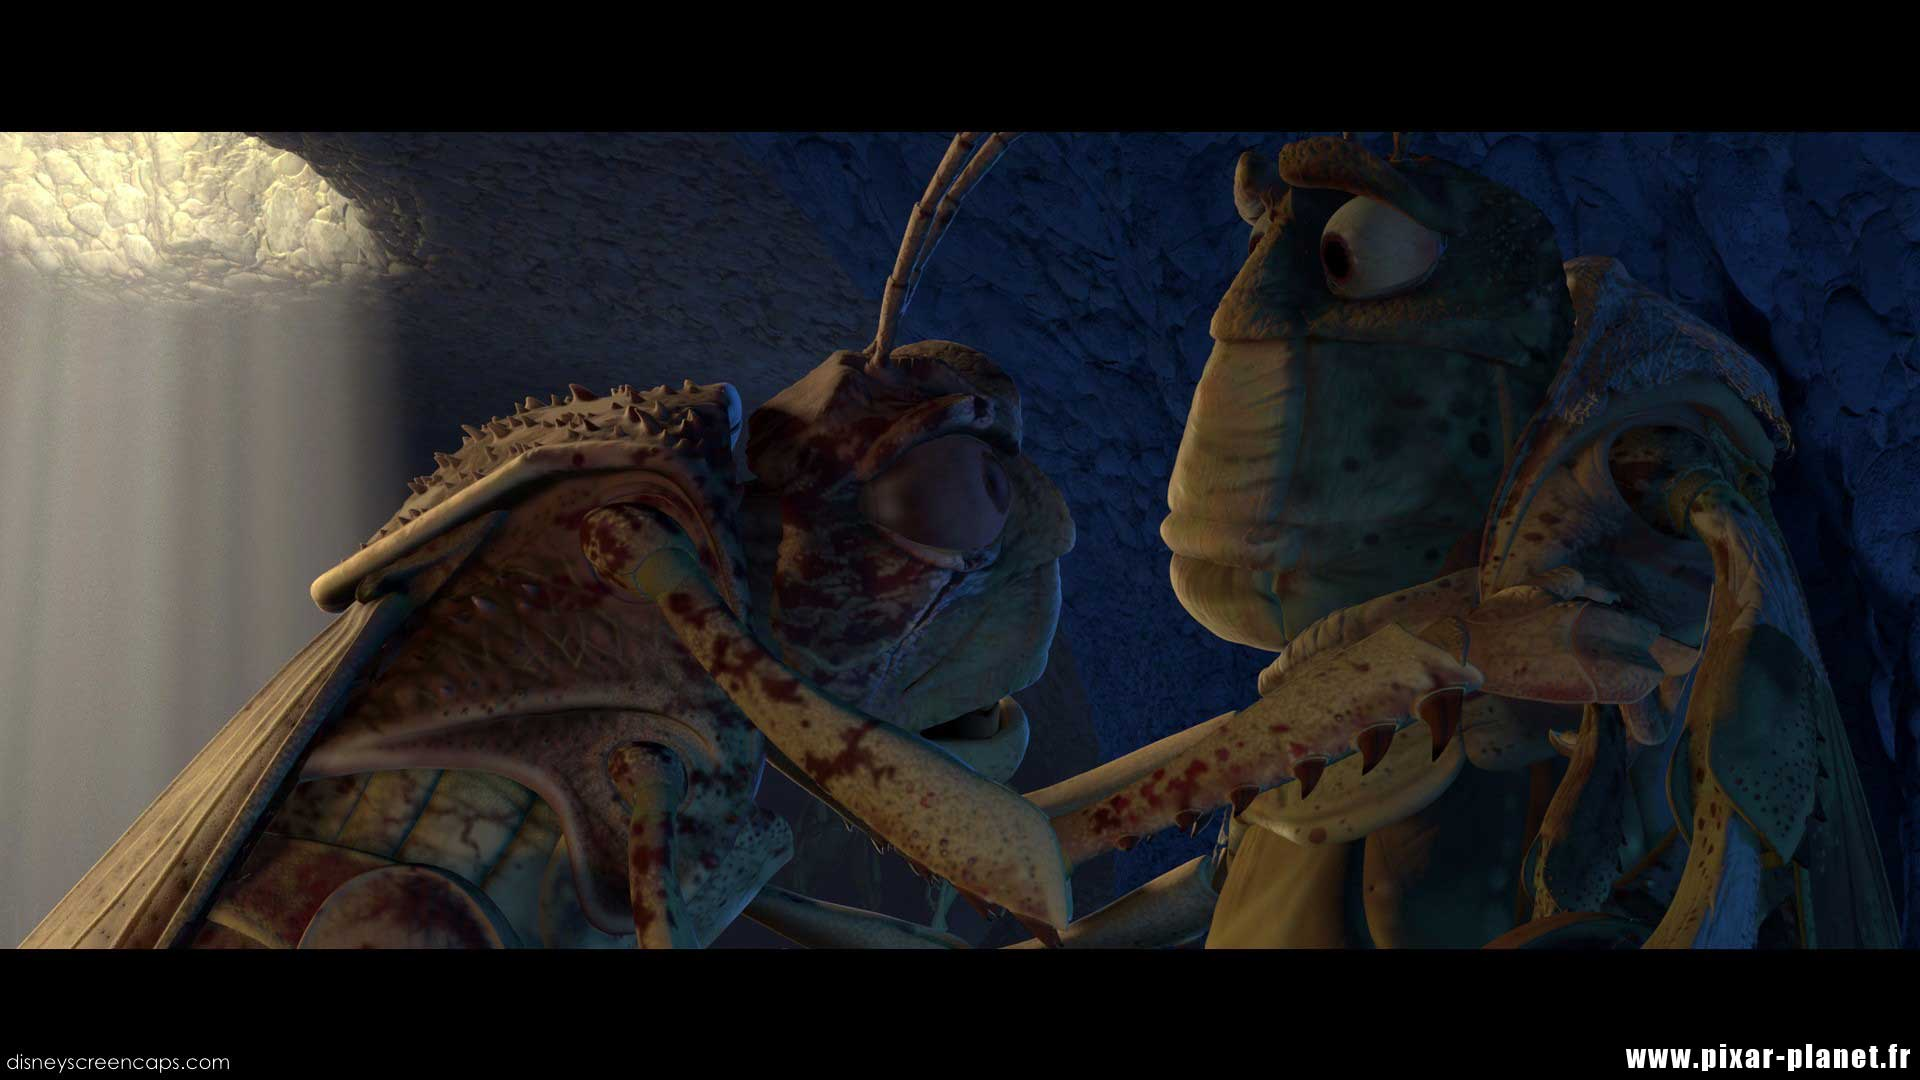 Pixar Planet Disney 1001 pattes bug life